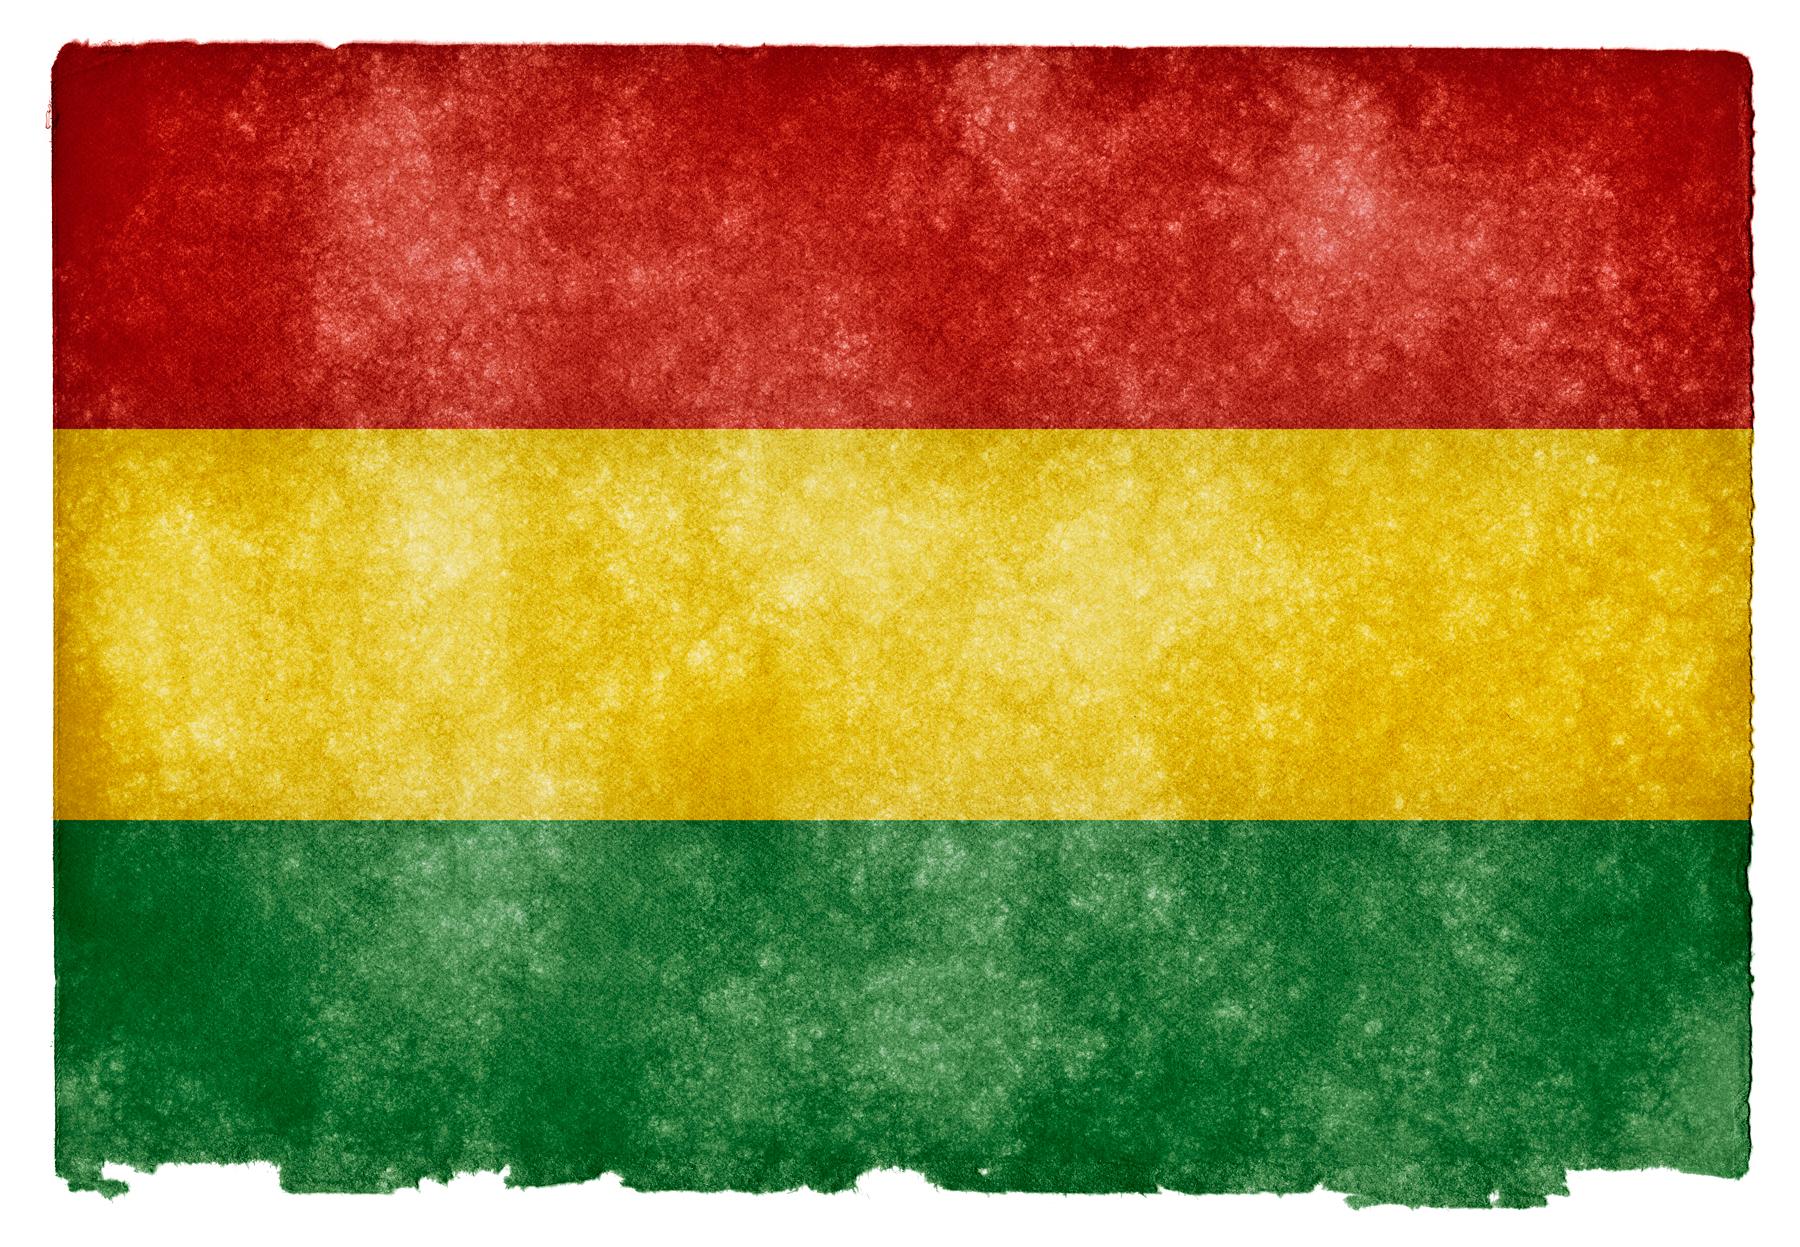 stockvault-bolivia-grunge-flag134076